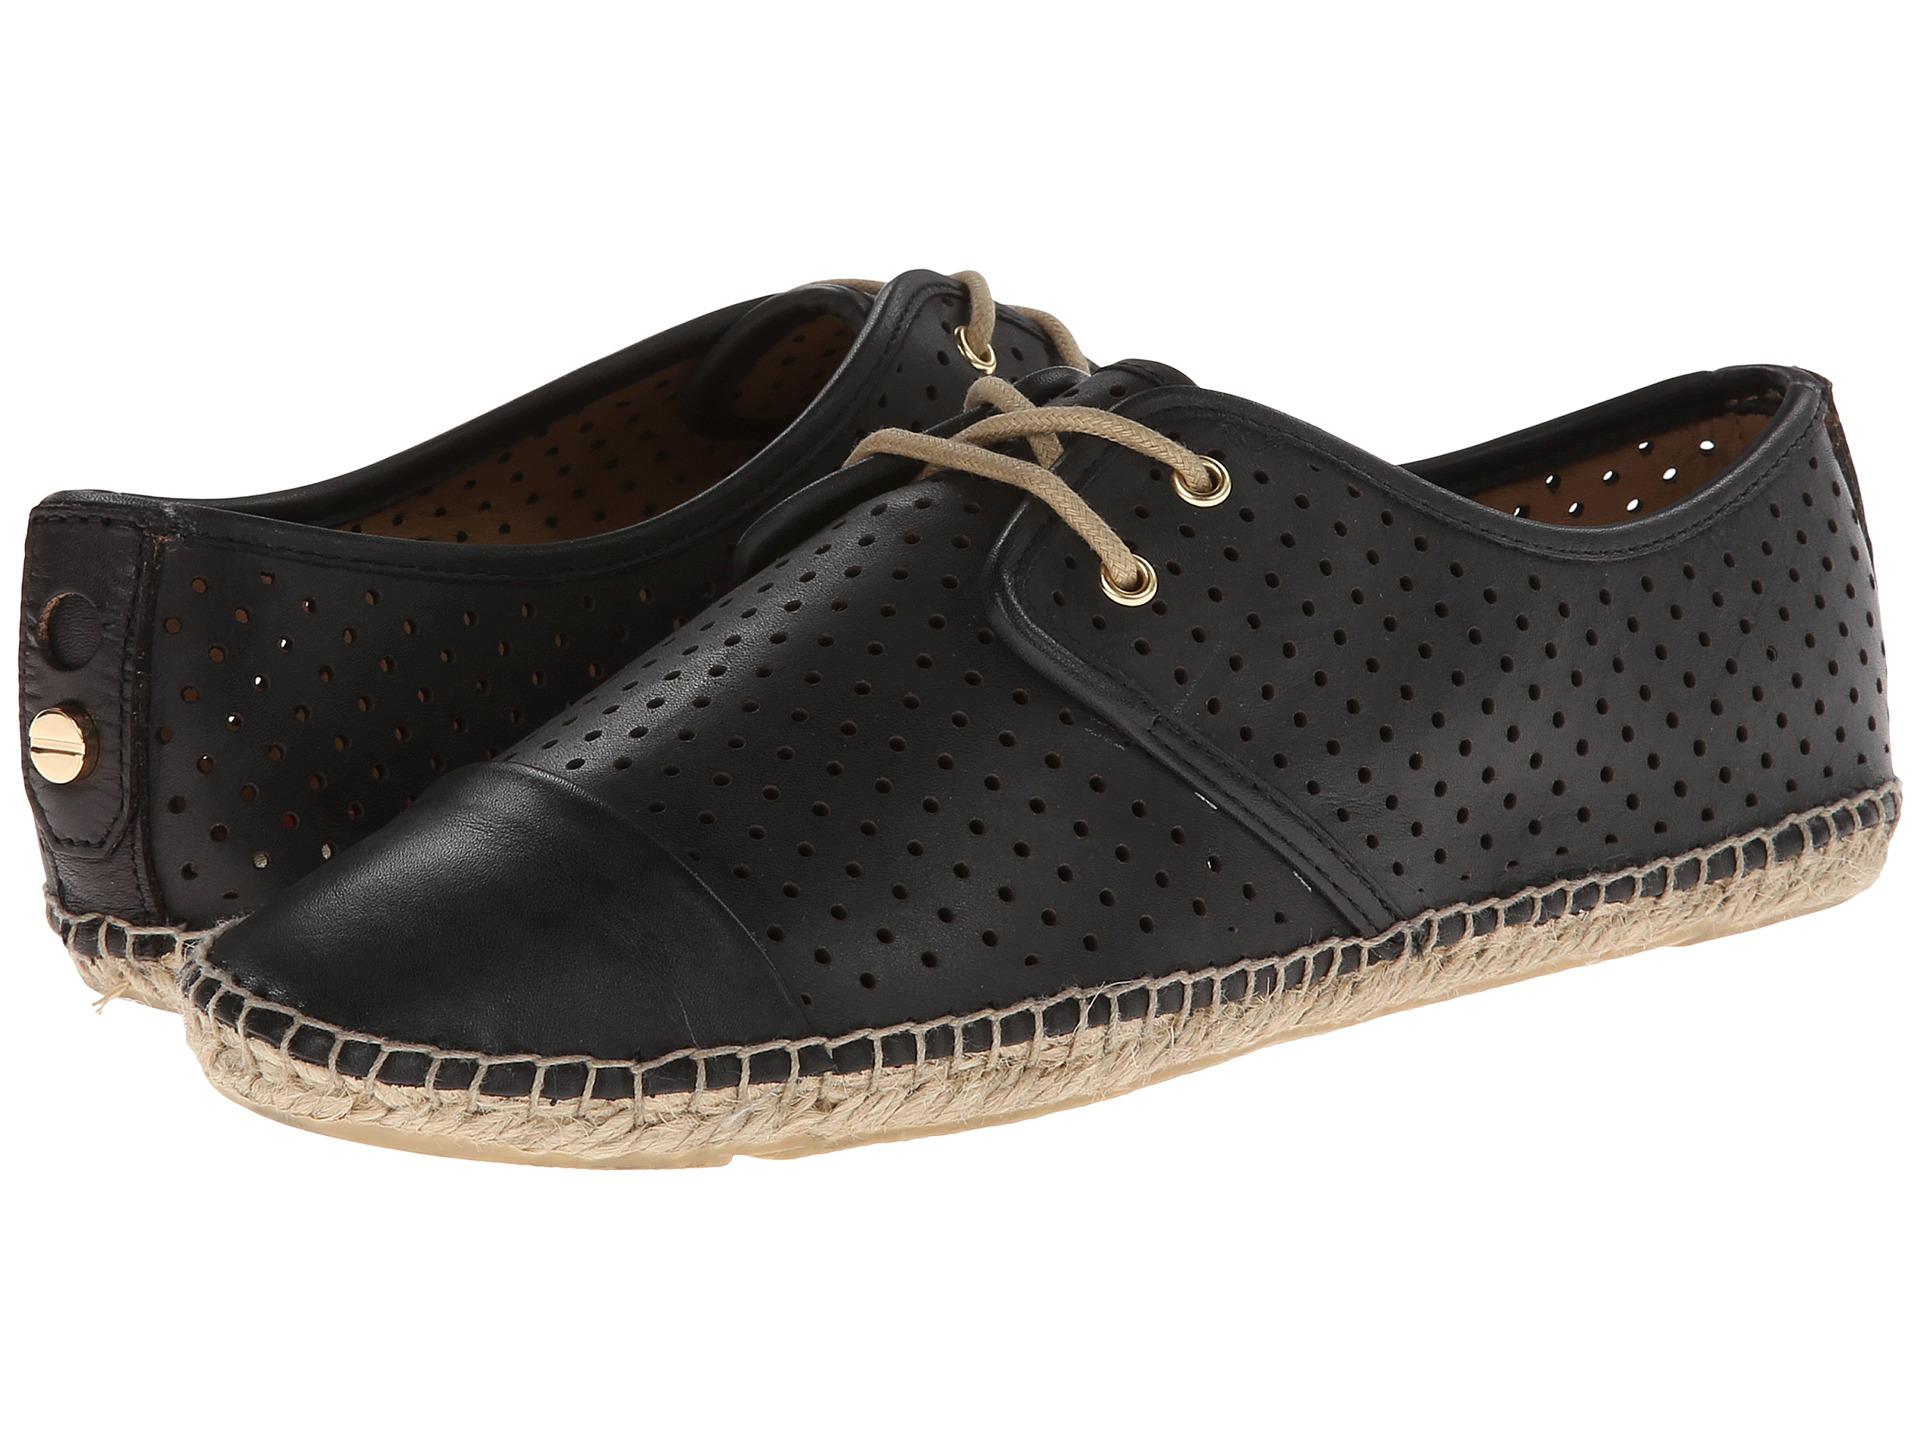 Isaac Mizrahi Shoes Size Chart